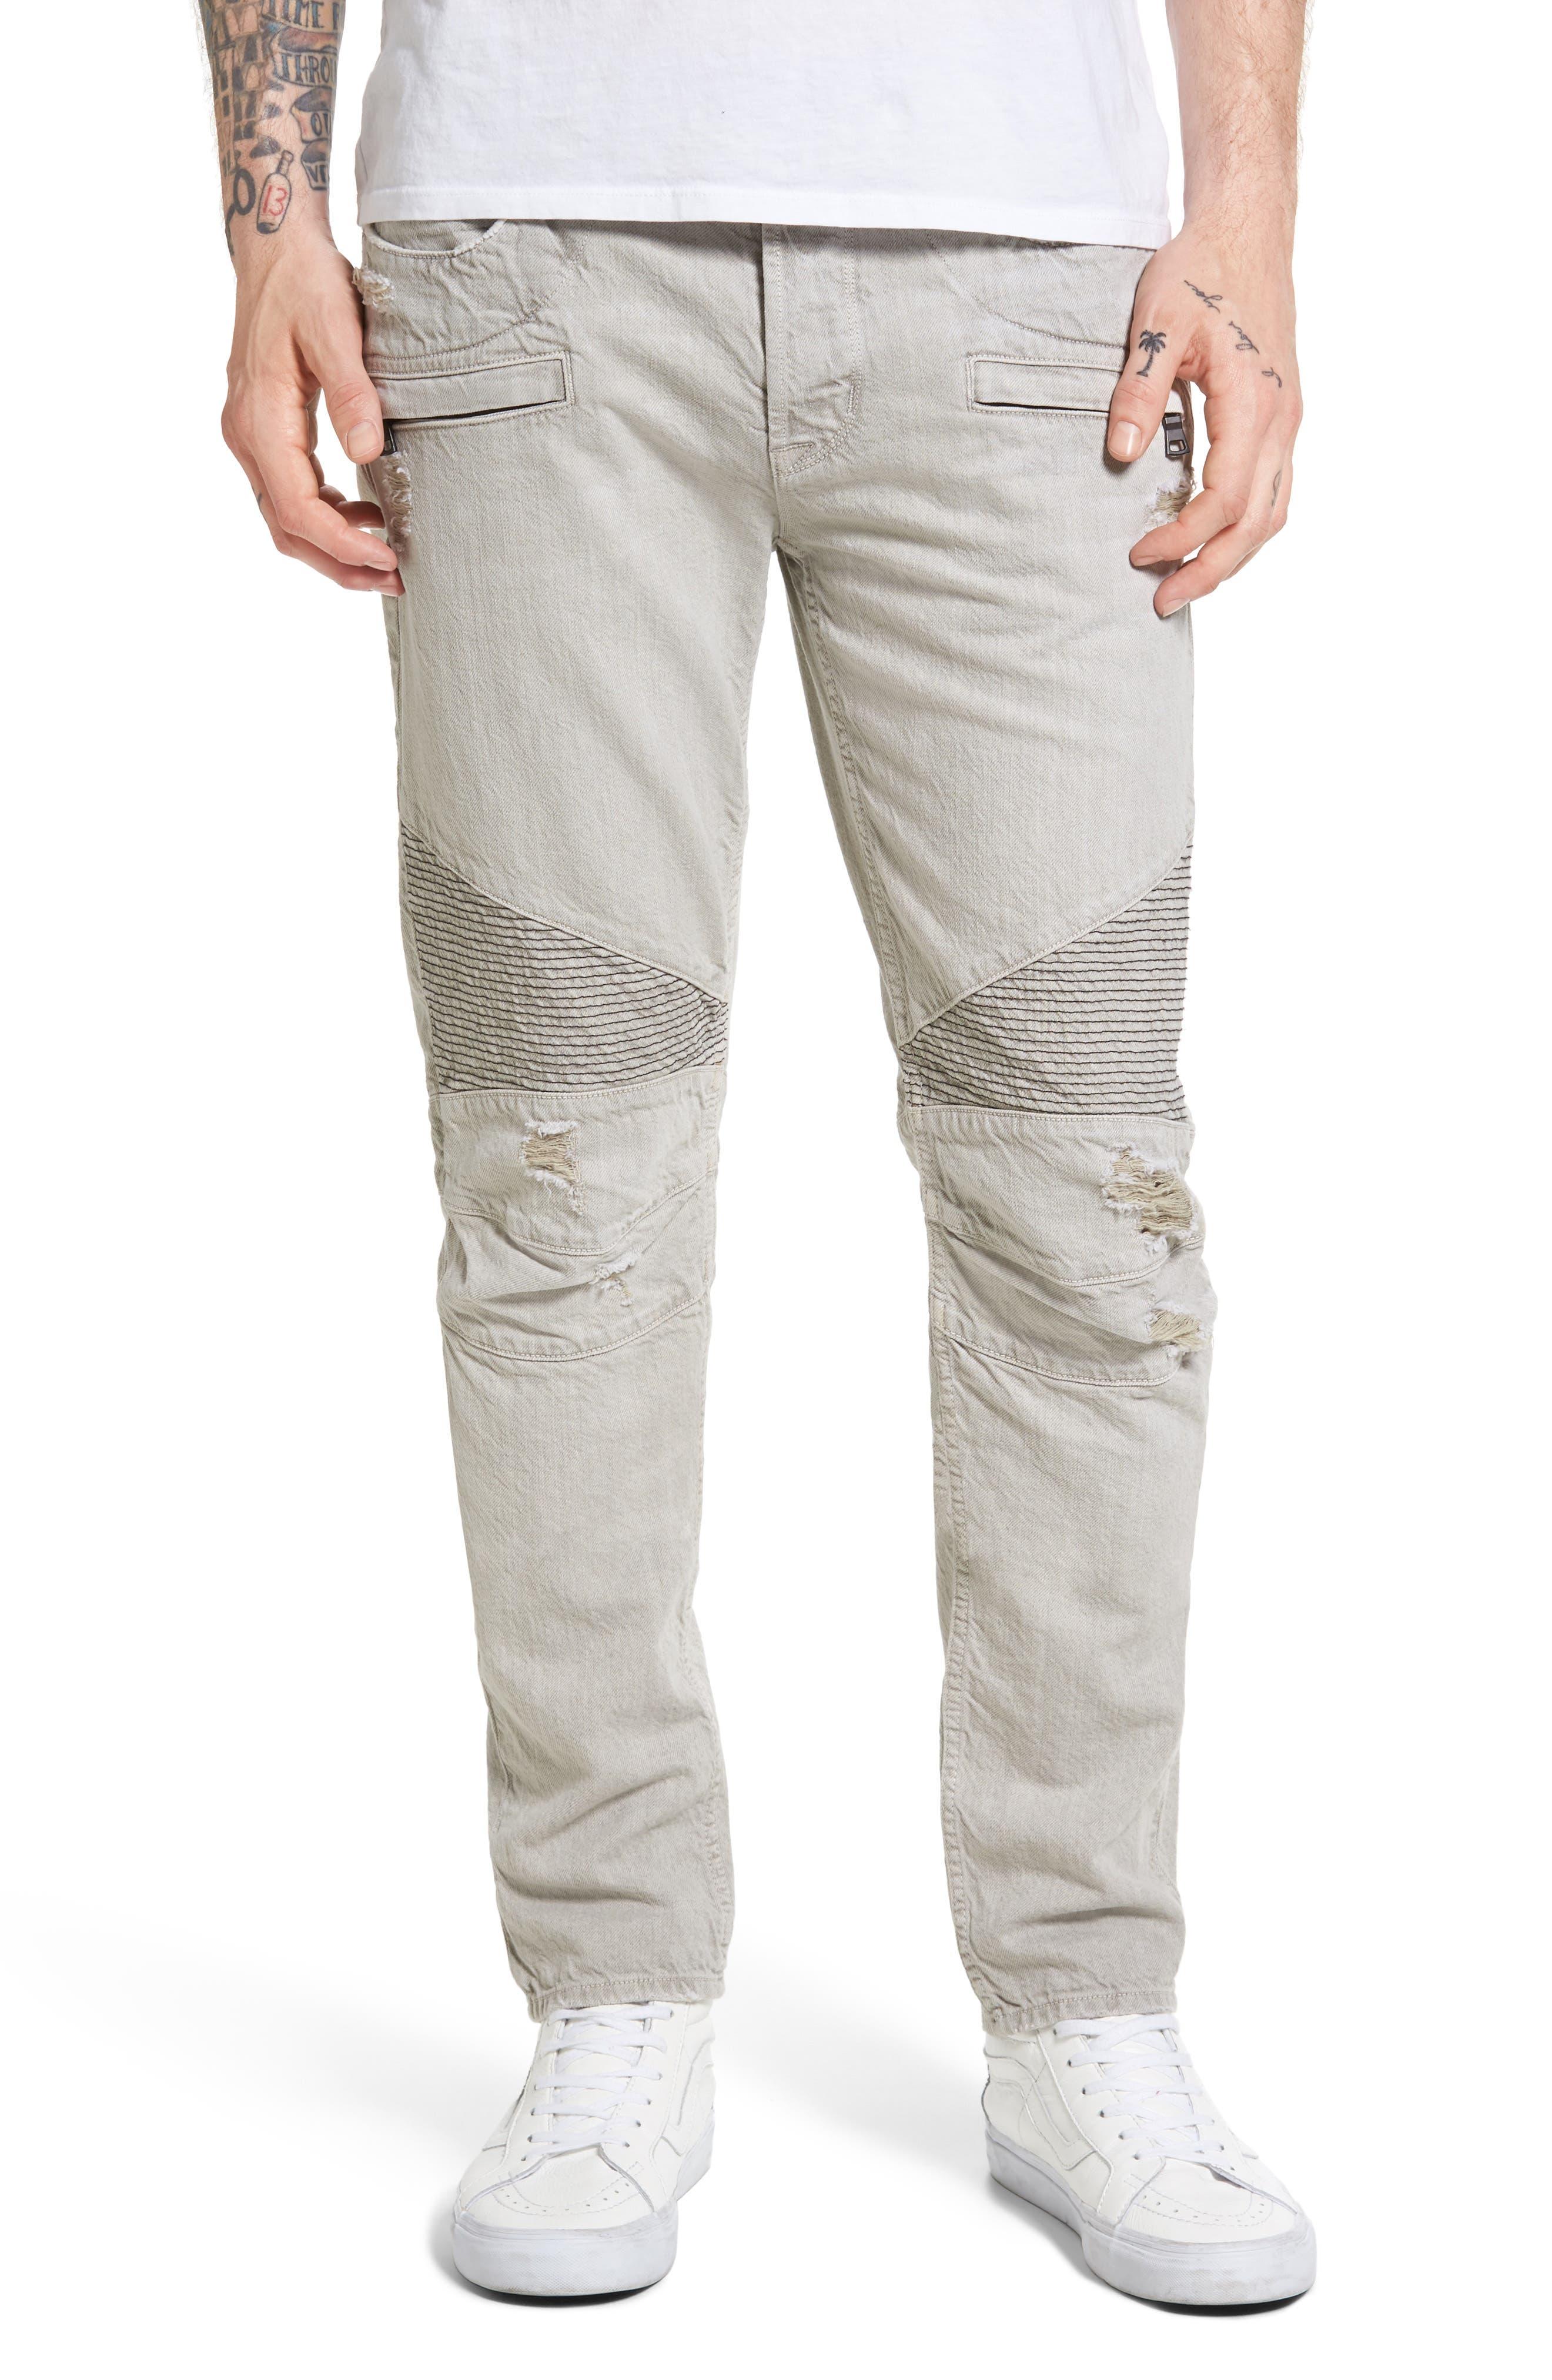 Alternate Image 1 Selected - Hudson Jeans Blinder Biker Skinny Fit Jeans (Adherence)